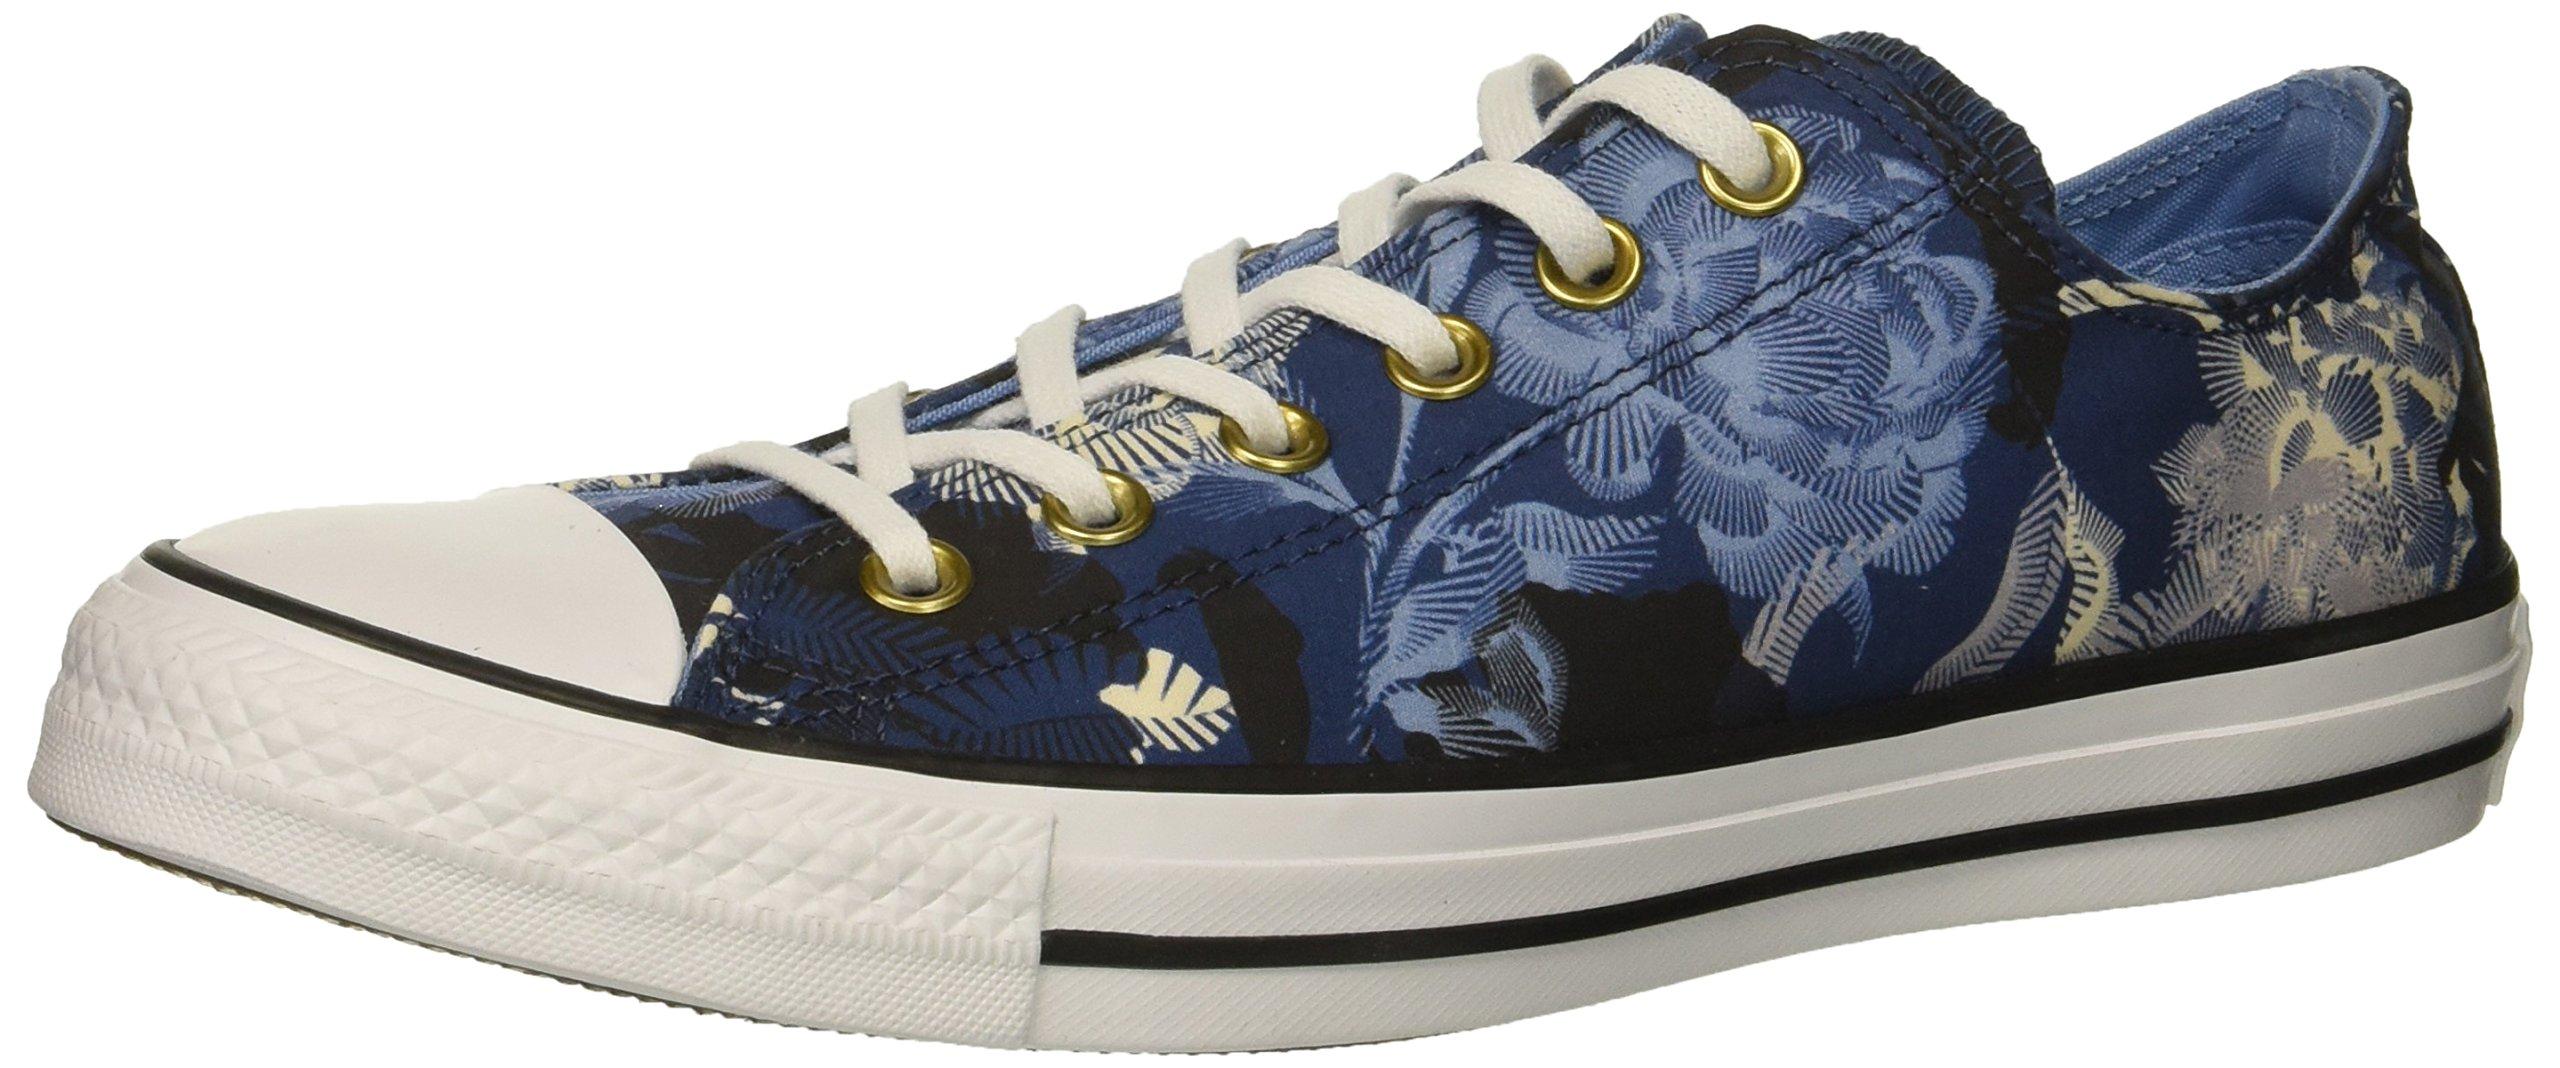 Converse Women's Chuck Taylor All Star Floral Print Low Top Sneaker, Mason Blue/Light Blue, 7.5 M US